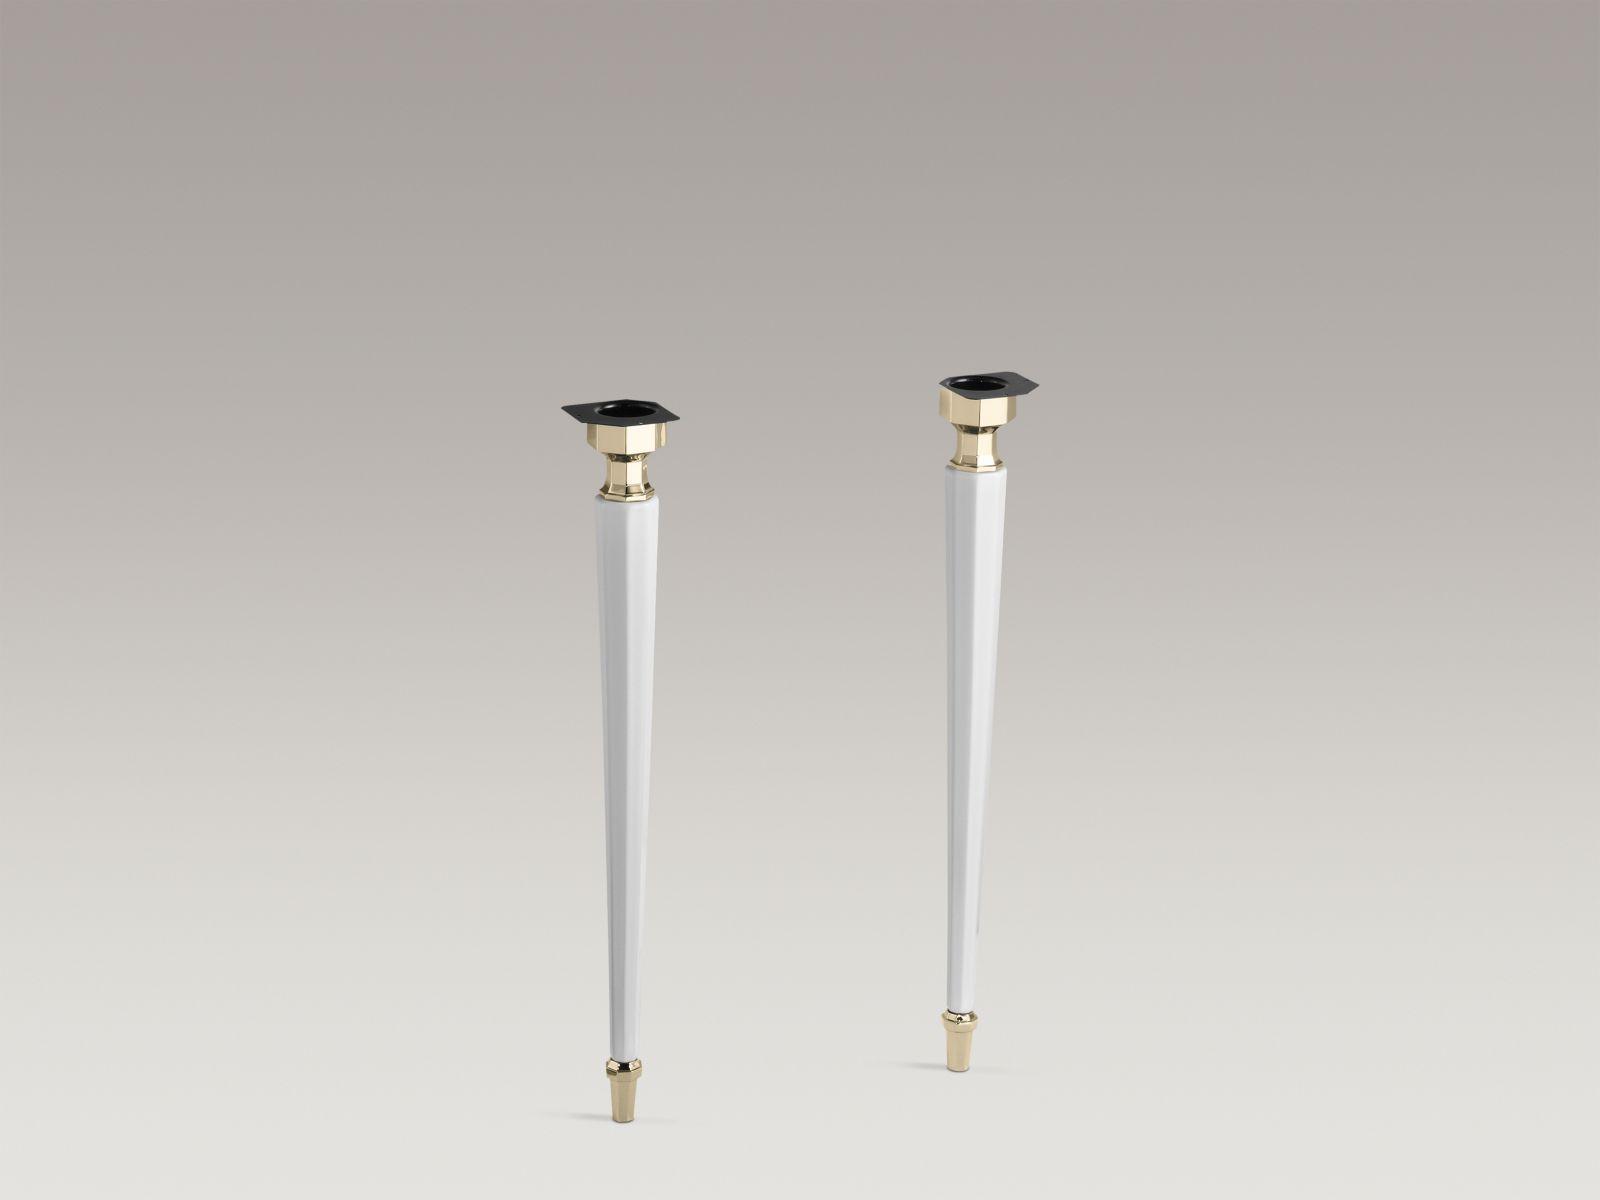 Kohler K-2317-AF-0 Kathryn Octagonal Fireclay Legs with Vibrant French Gold Trim White